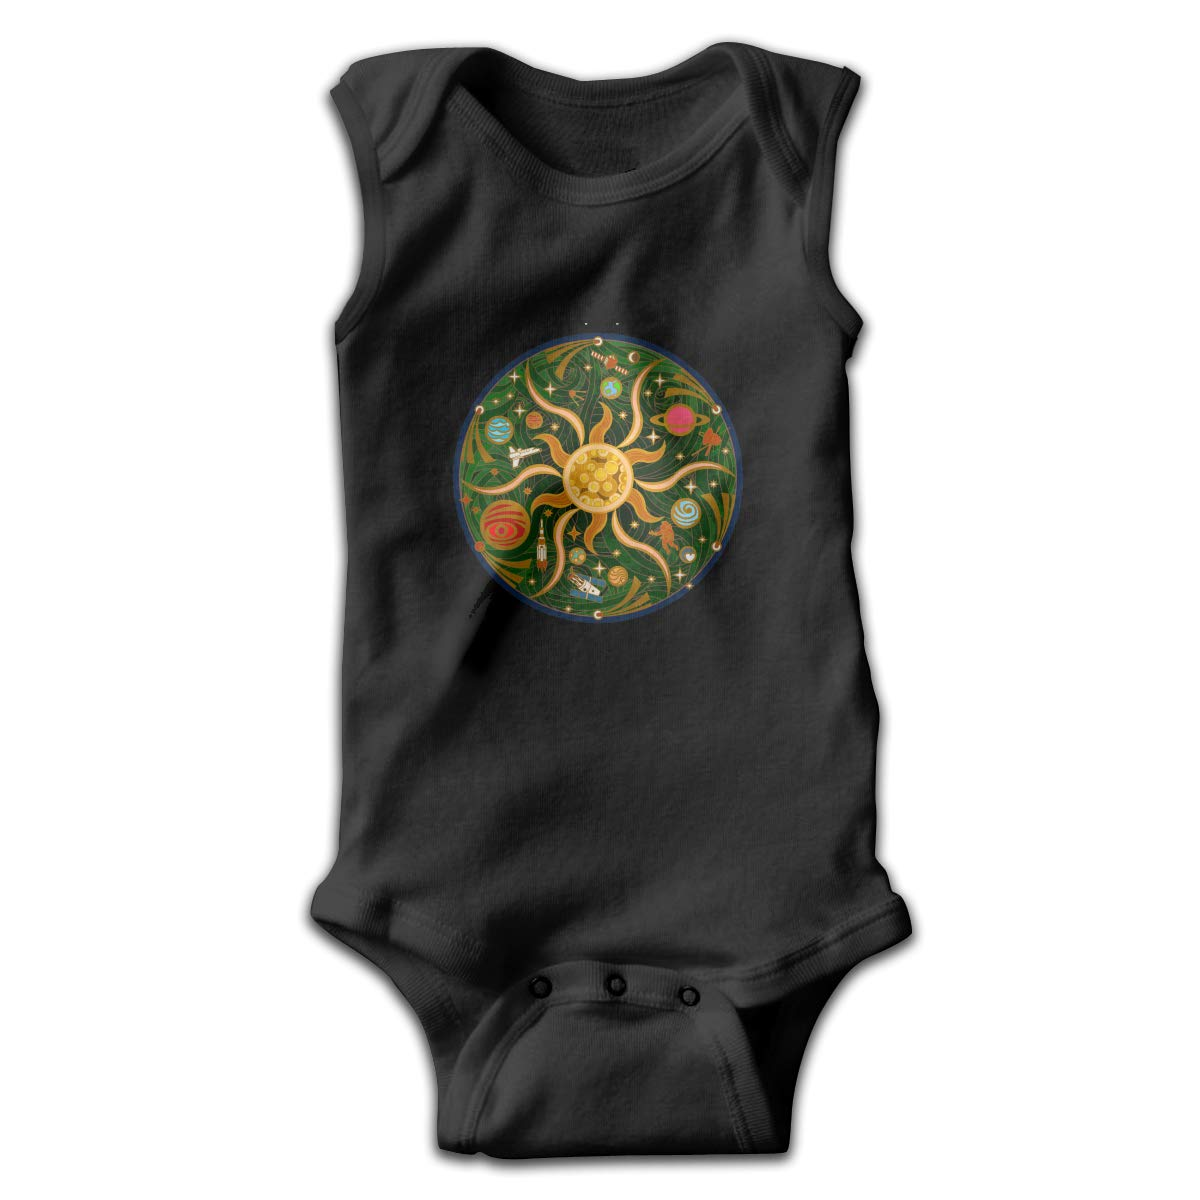 Dunpaiaa Map of Solar Newborn Crawling Suit Sleeveless Romper Bodysuit Onesies Jumpsuit Black